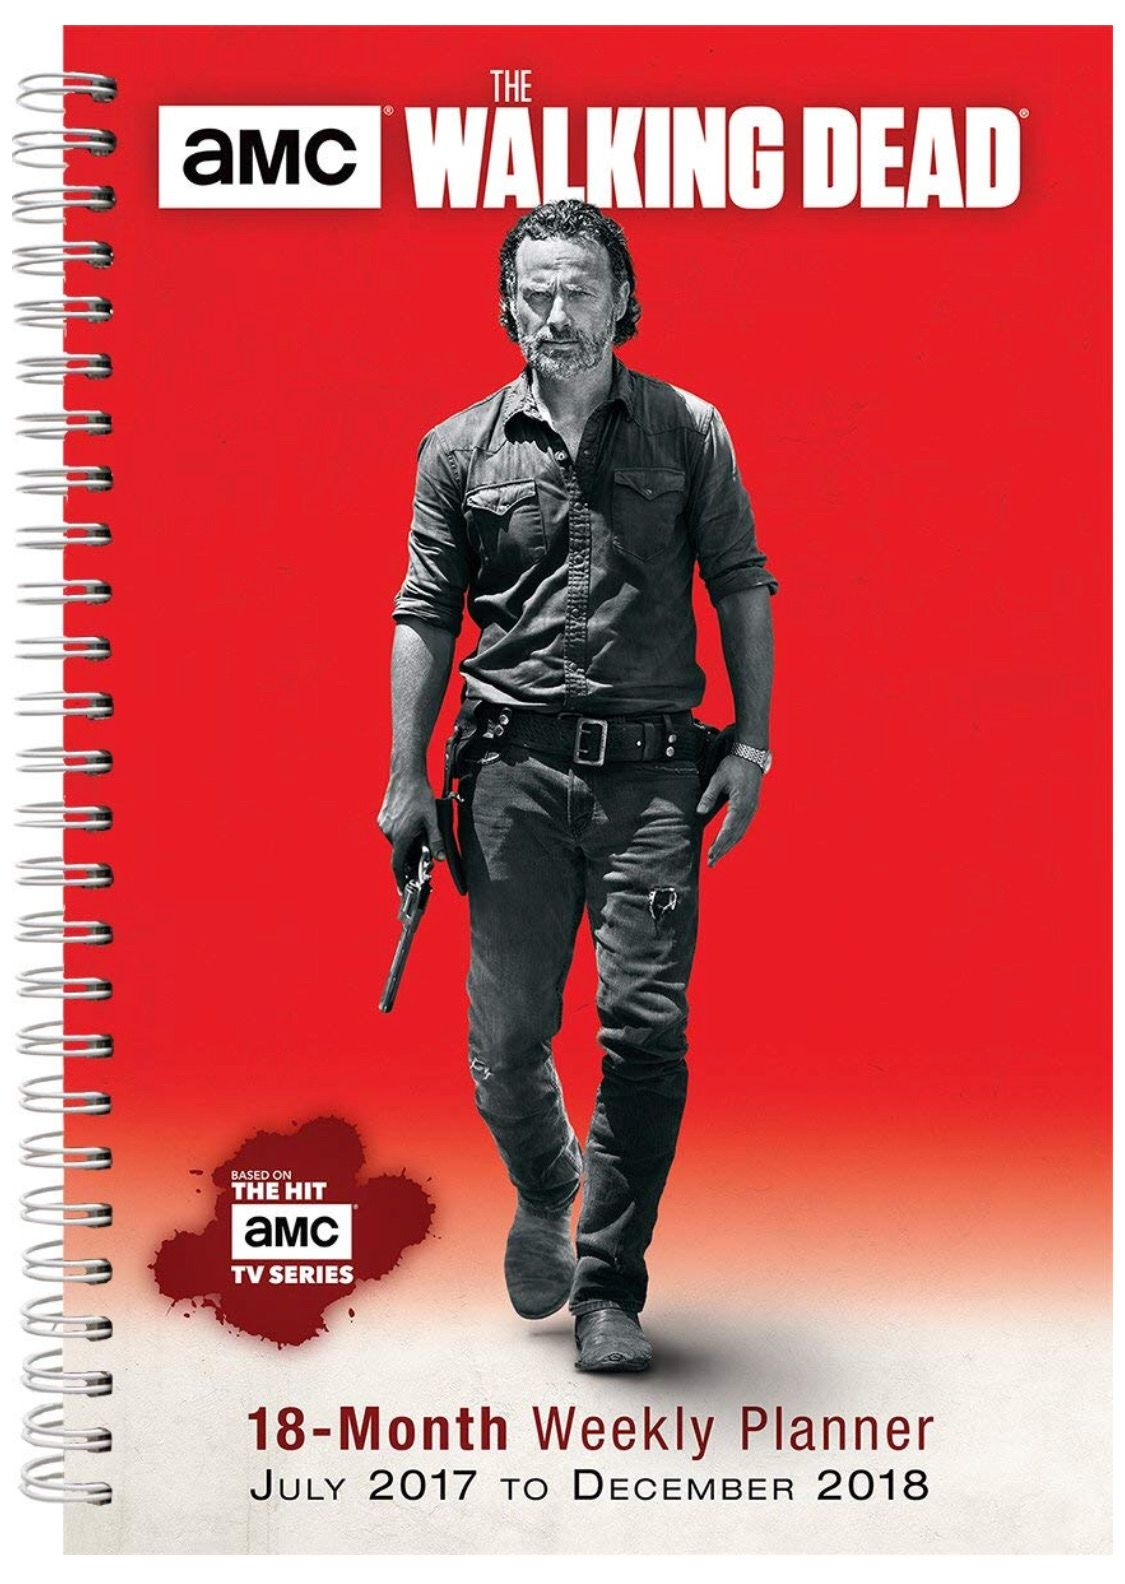 The Walking Dead Engagement Calendar The Walking Dead Amc Walking Dead The Walking Dead Merchandise